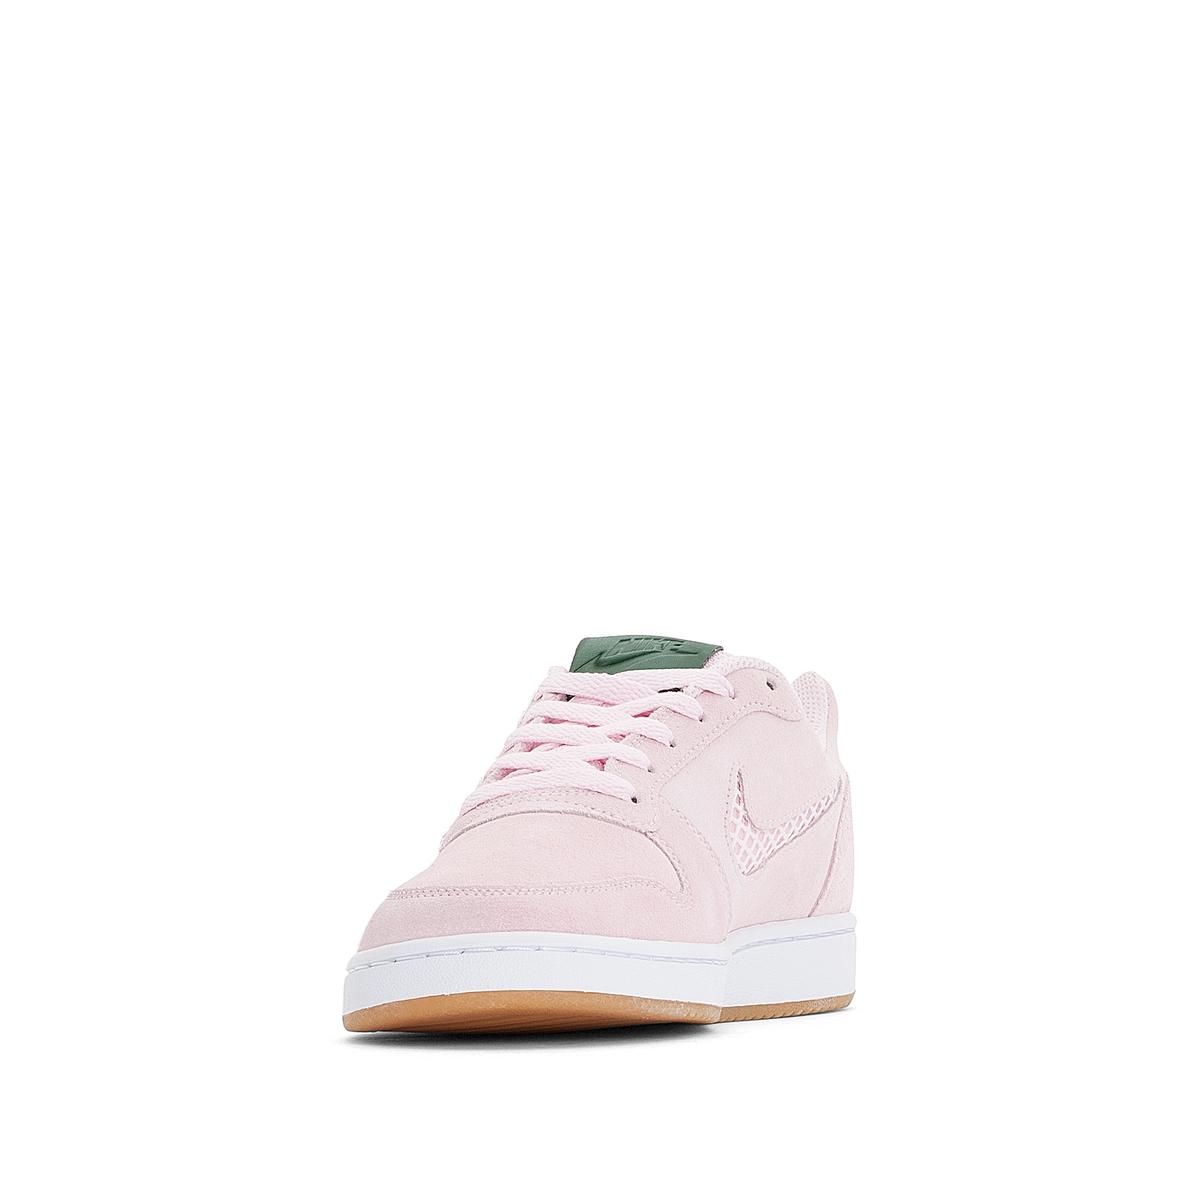 Imagen secundaria de producto de Zapatillas Ebernon Low Prem - Nike